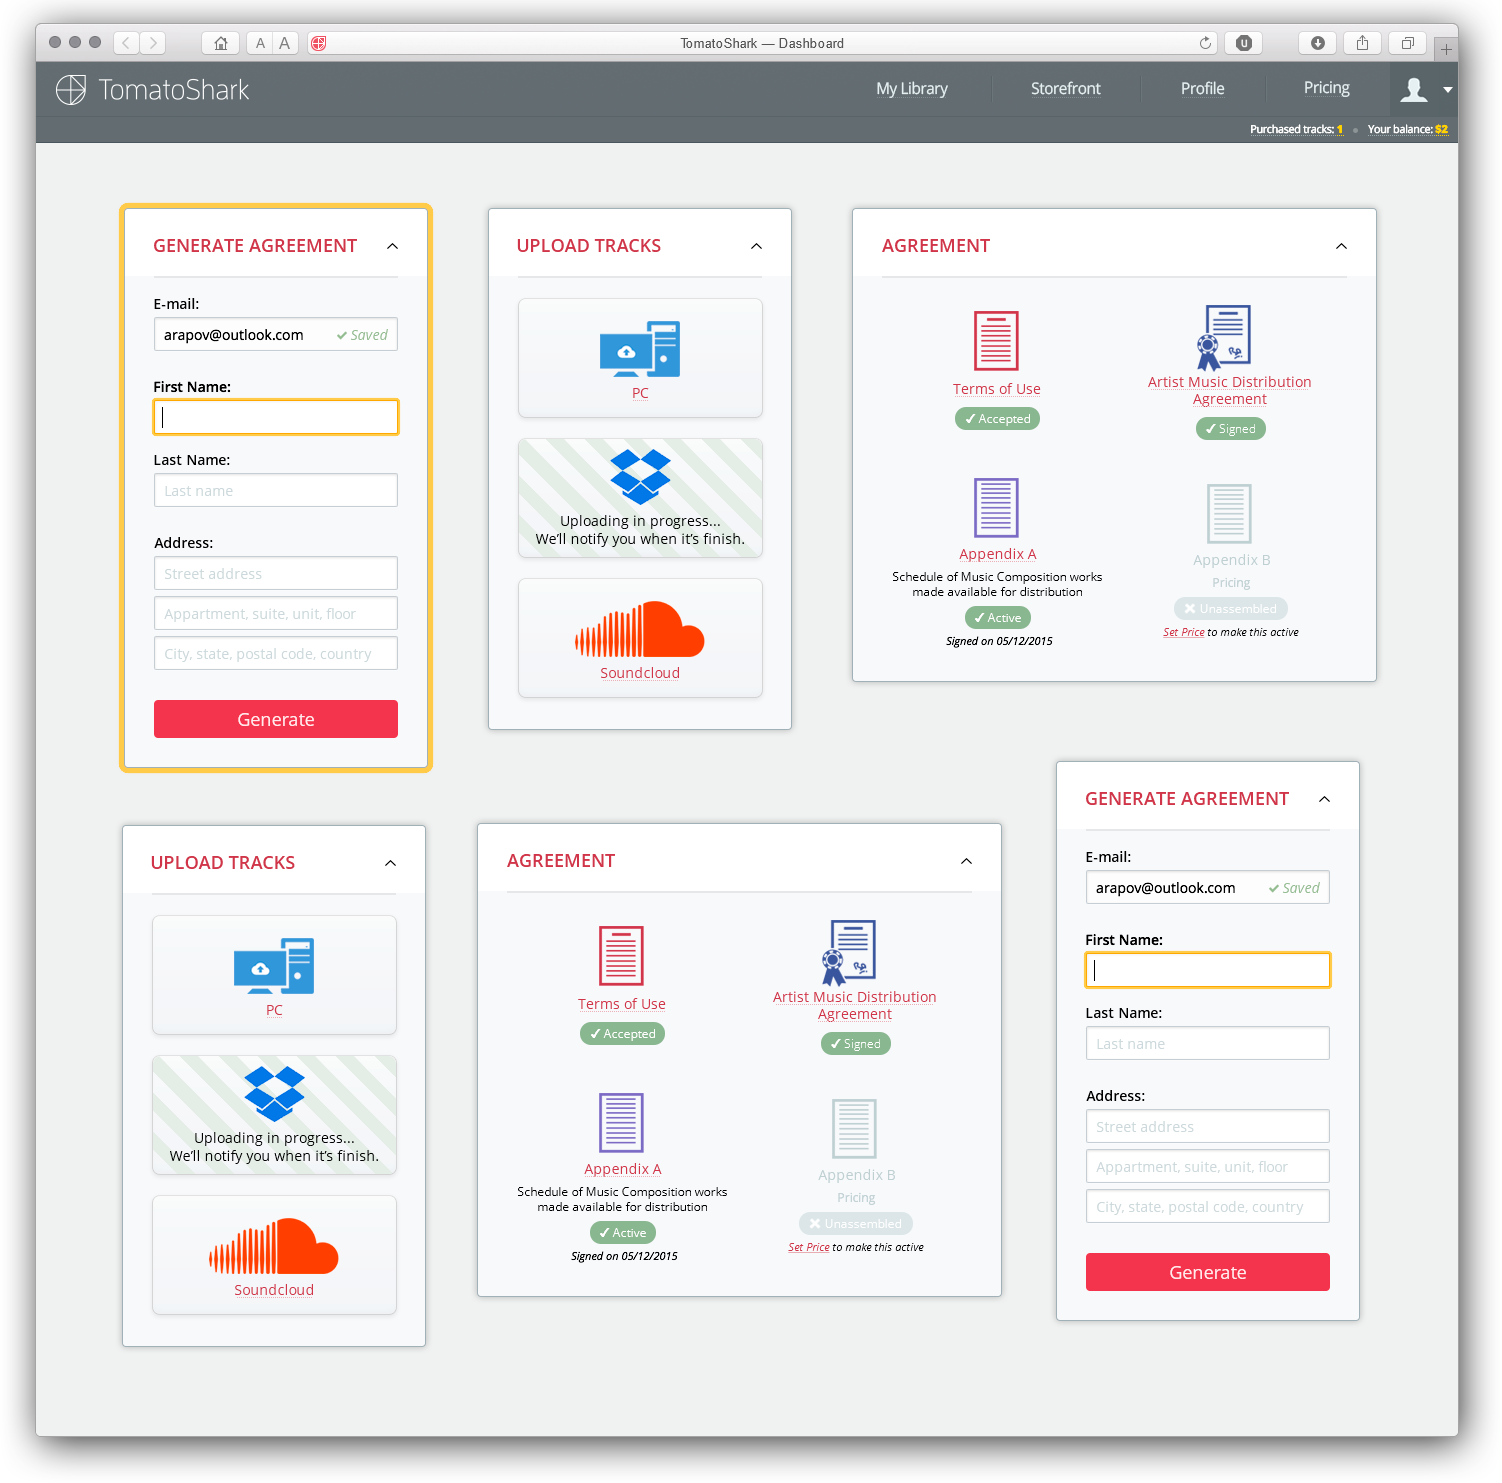 TomatoShark Inc. — Dashboard